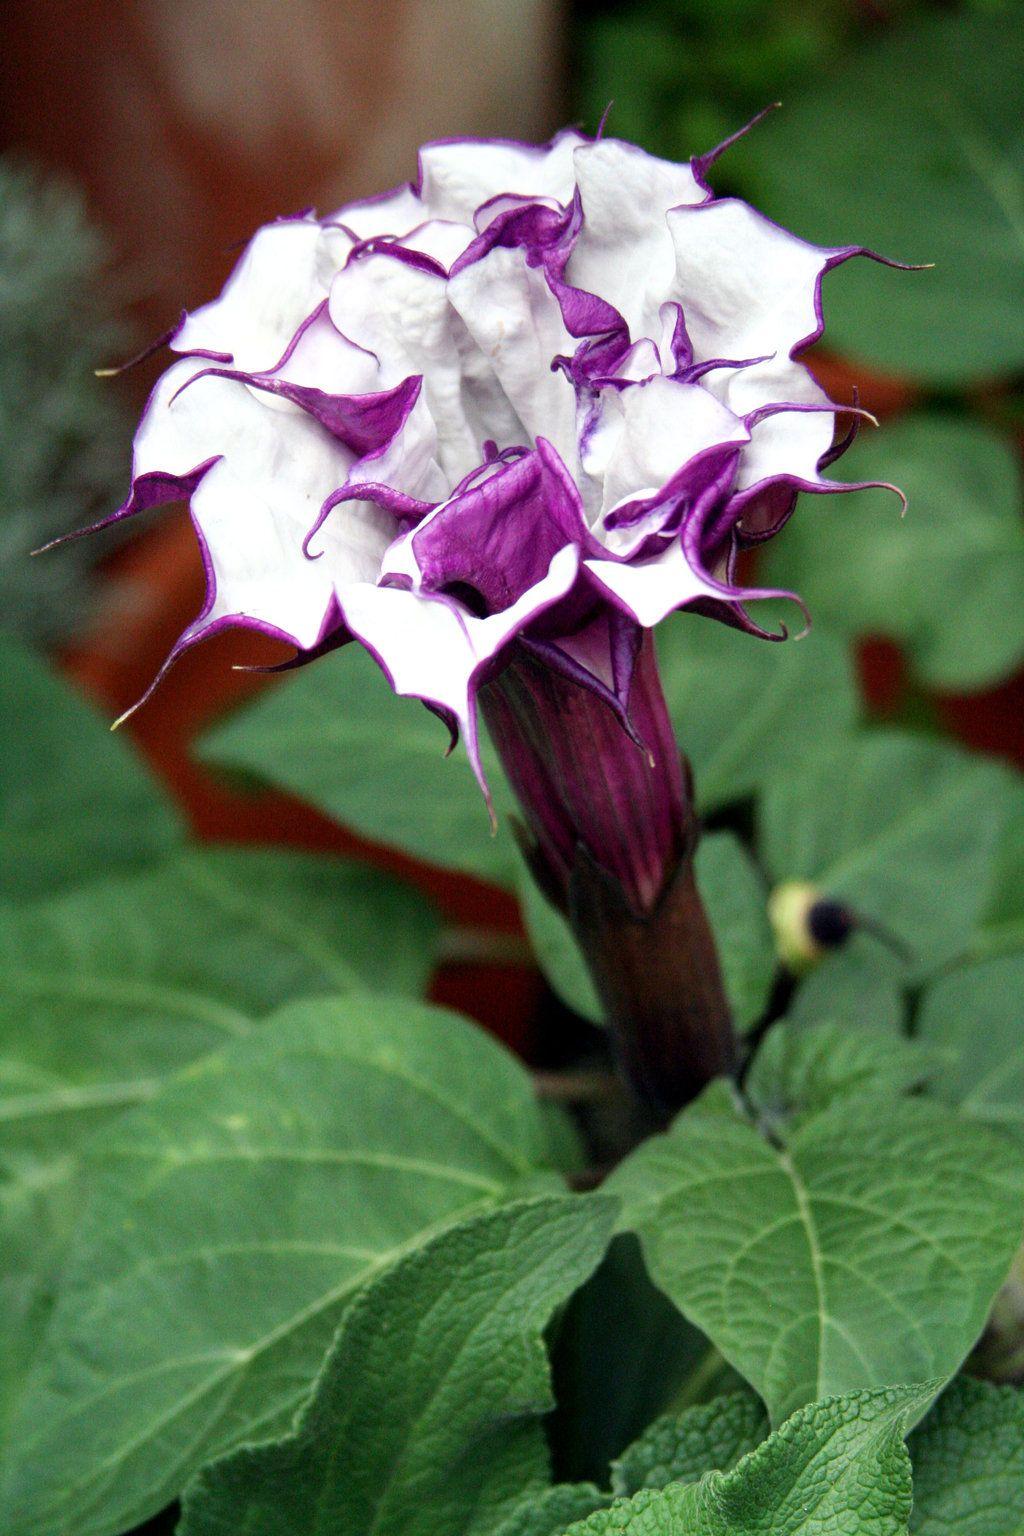 Beautiful but deadly flowersnot all flowers are named bloogers beautiful but deadly flowersnot all flowers are named bloogers get your groove on flores pinterest flores izmirmasajfo